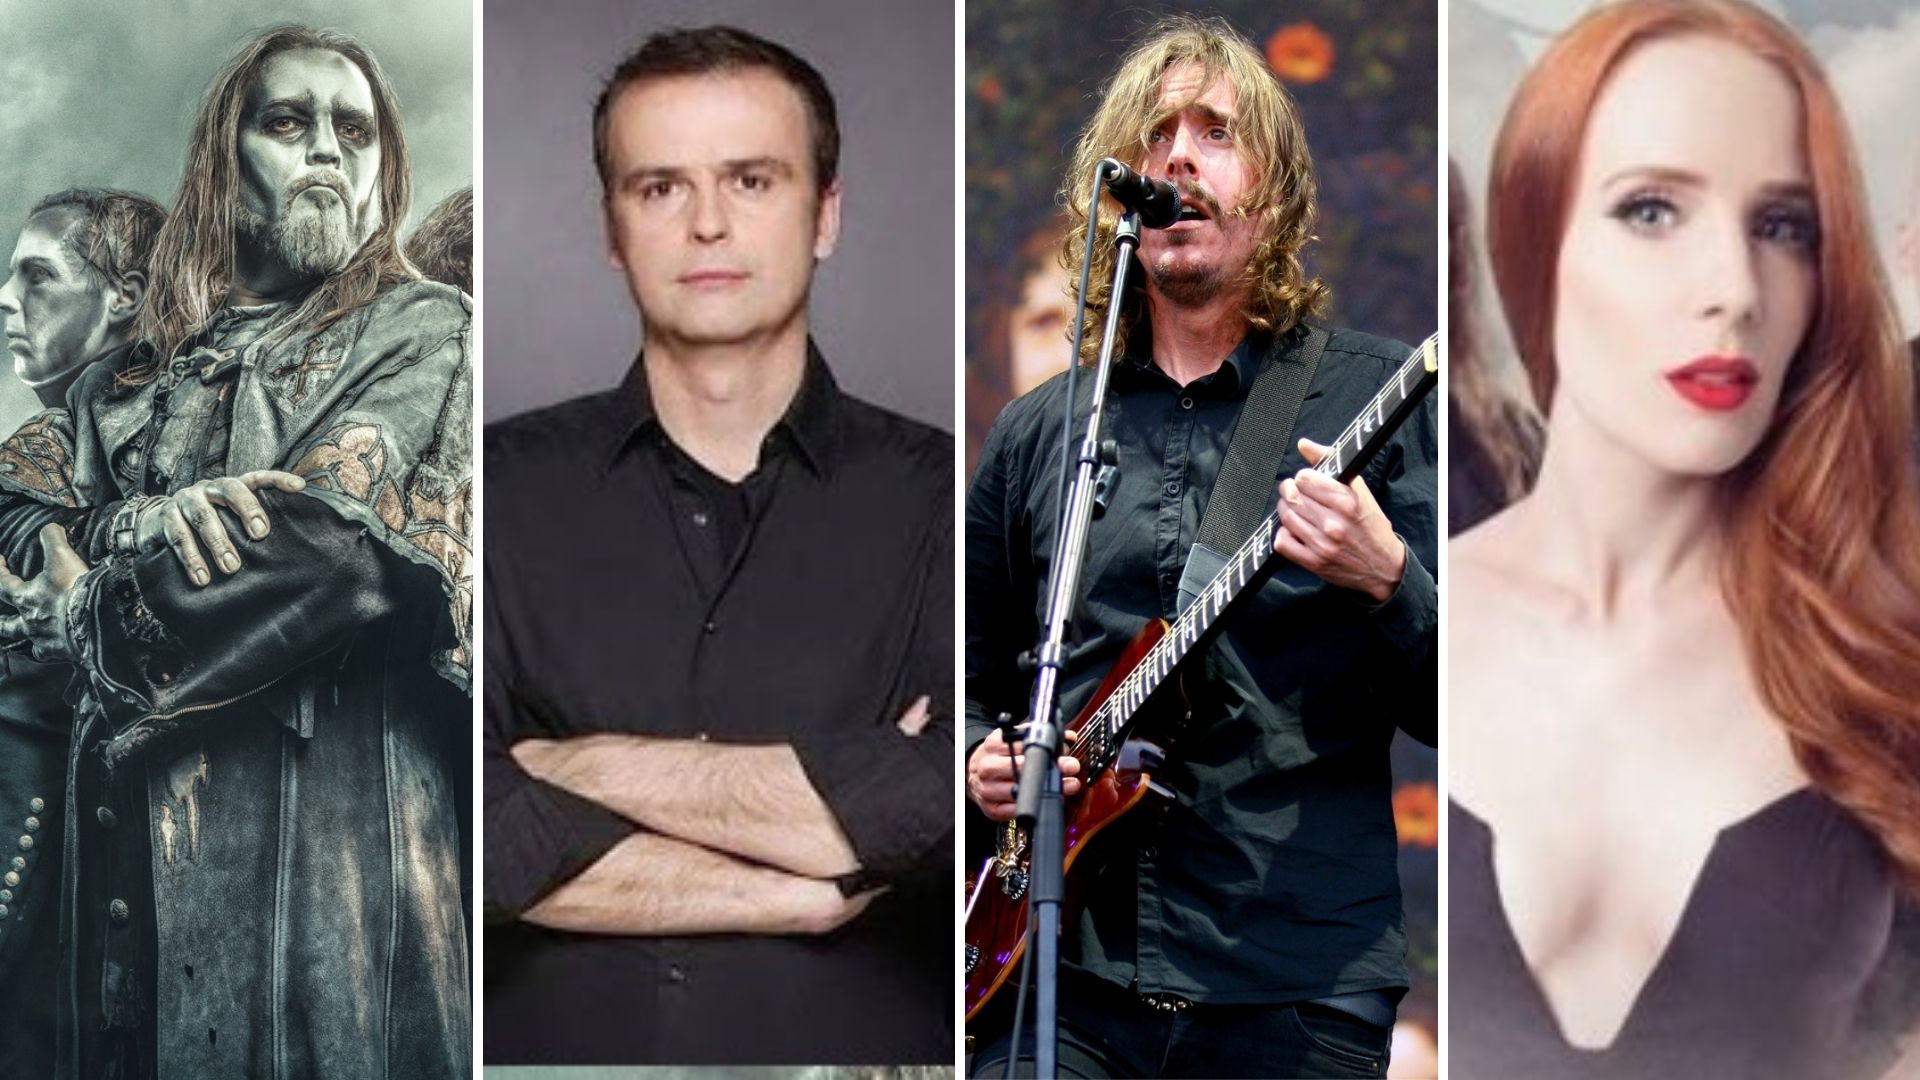 Powerwolf Opeth Blind Guardian Epica Leyendas Rock 2022